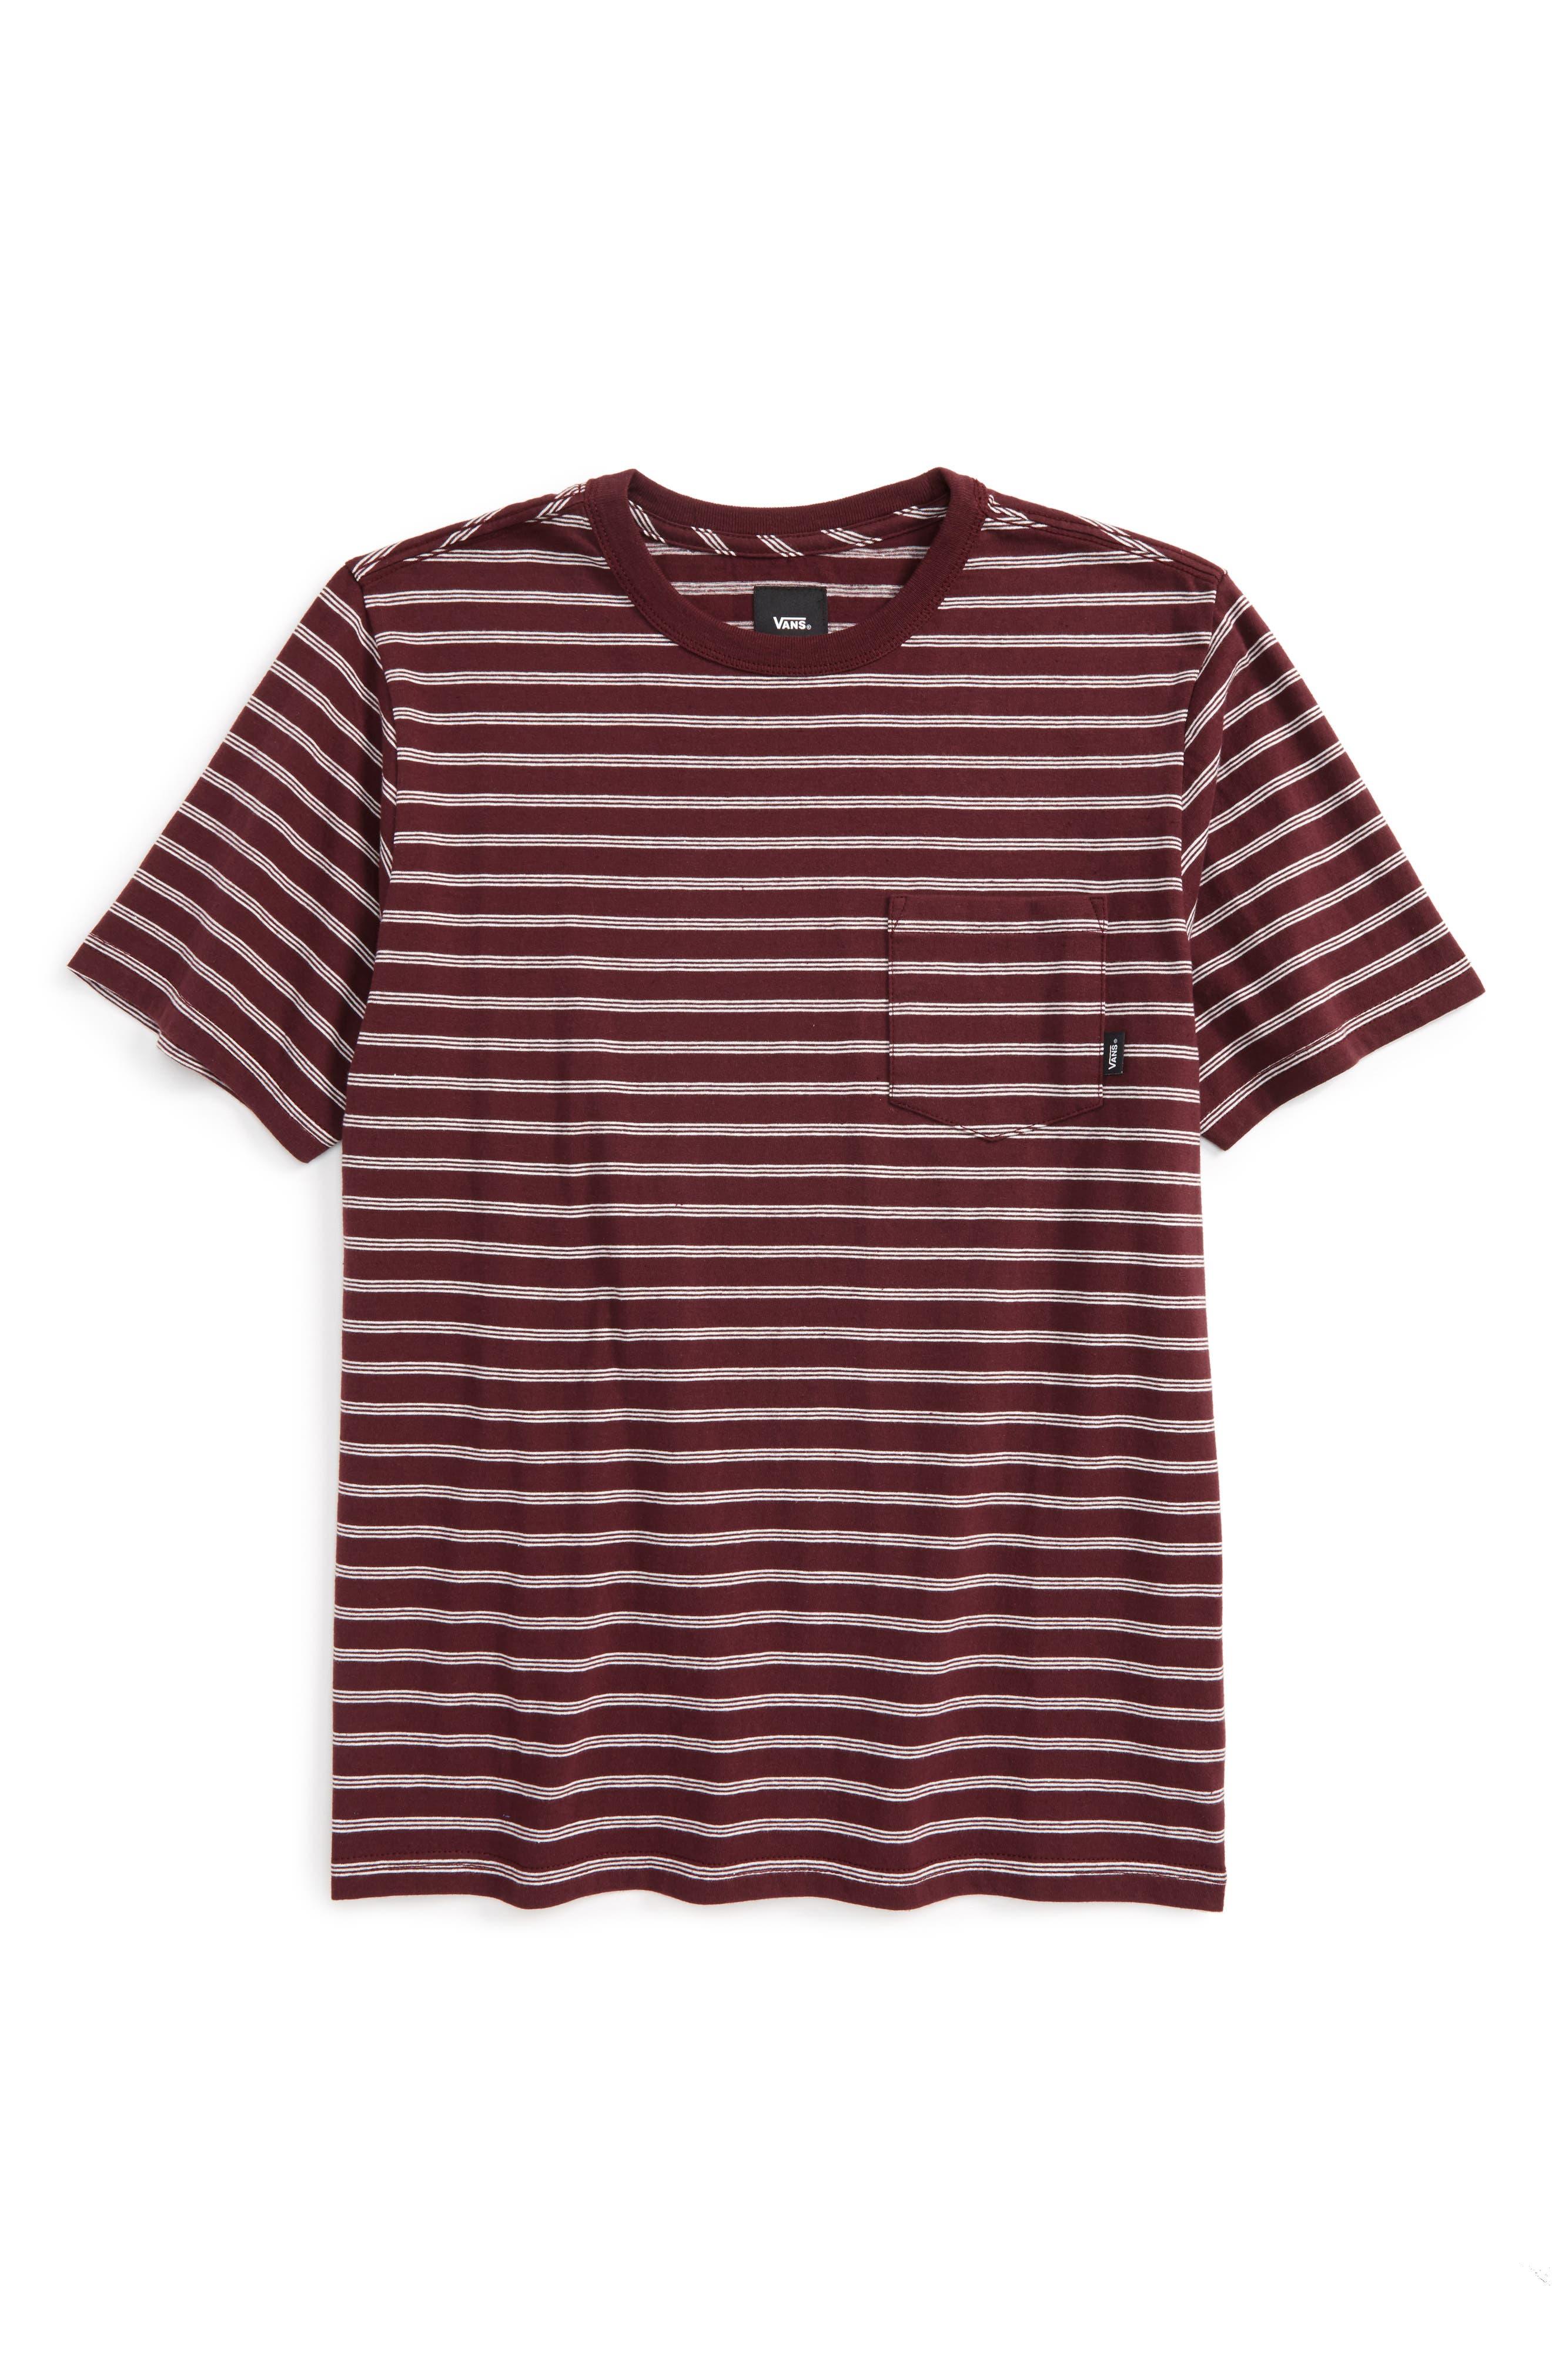 Lined Up Knit T-Shirt,                         Main,                         color, Port Royale